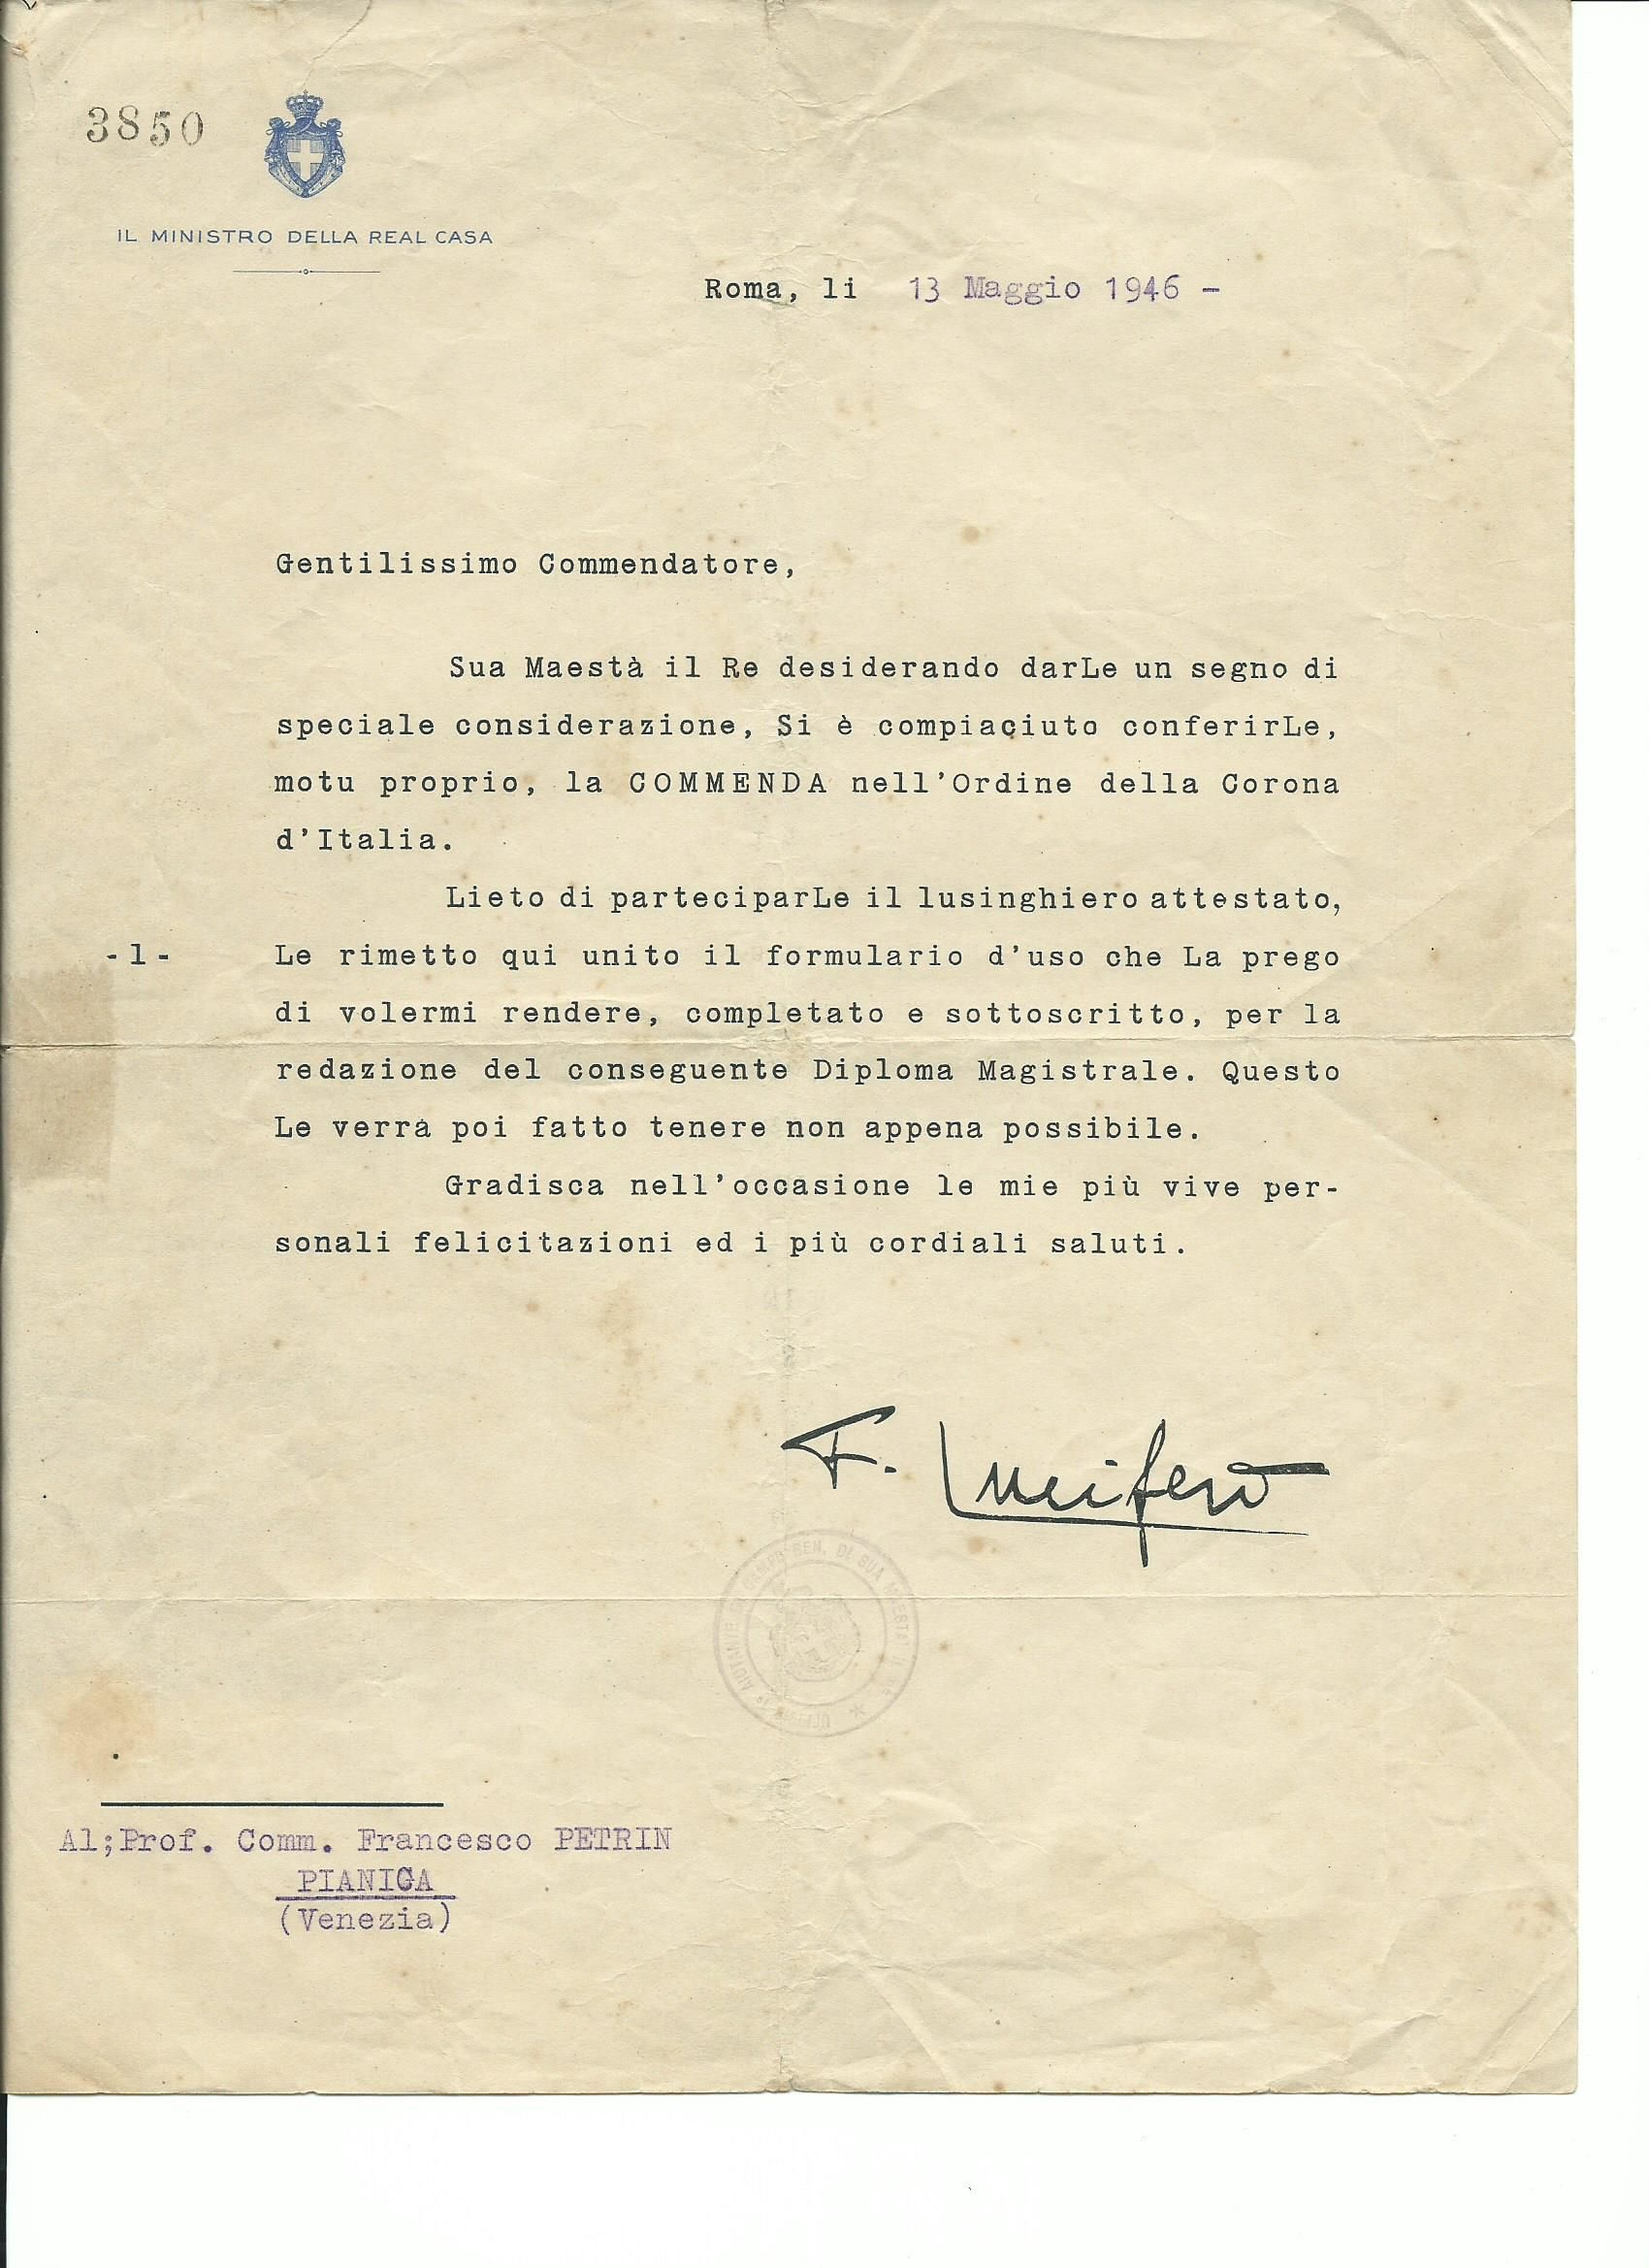 Re Umberto II concede, motu proprio, la commenda a Petrin Francesco (1906-1980),Wikipedia. https://it.wikipedia.org/wiki/Francesco_Petrin